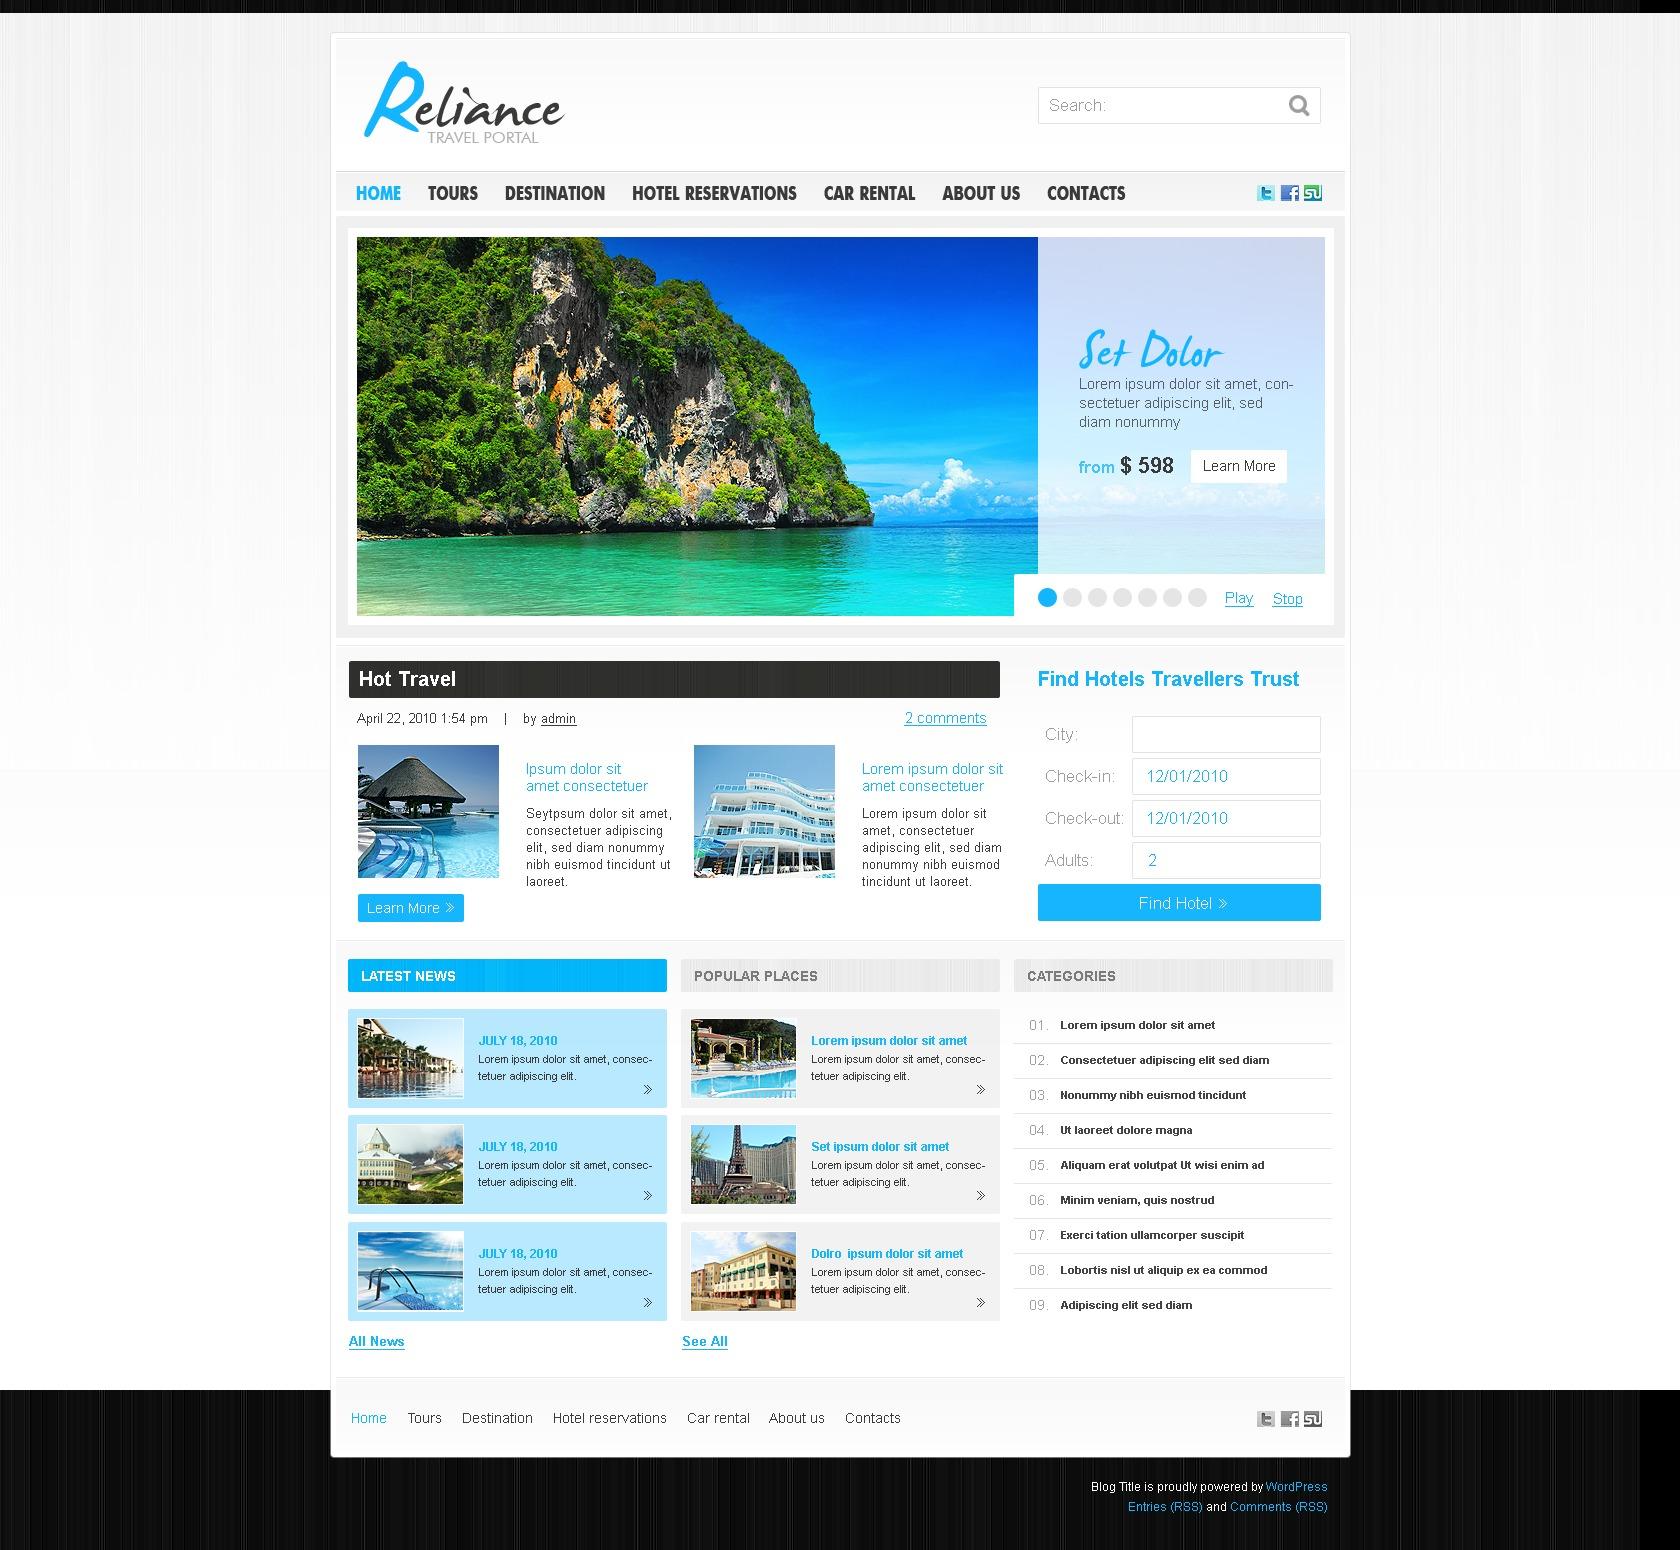 Seyahat Rehberi Wordpress #28831 - Ekran resmi